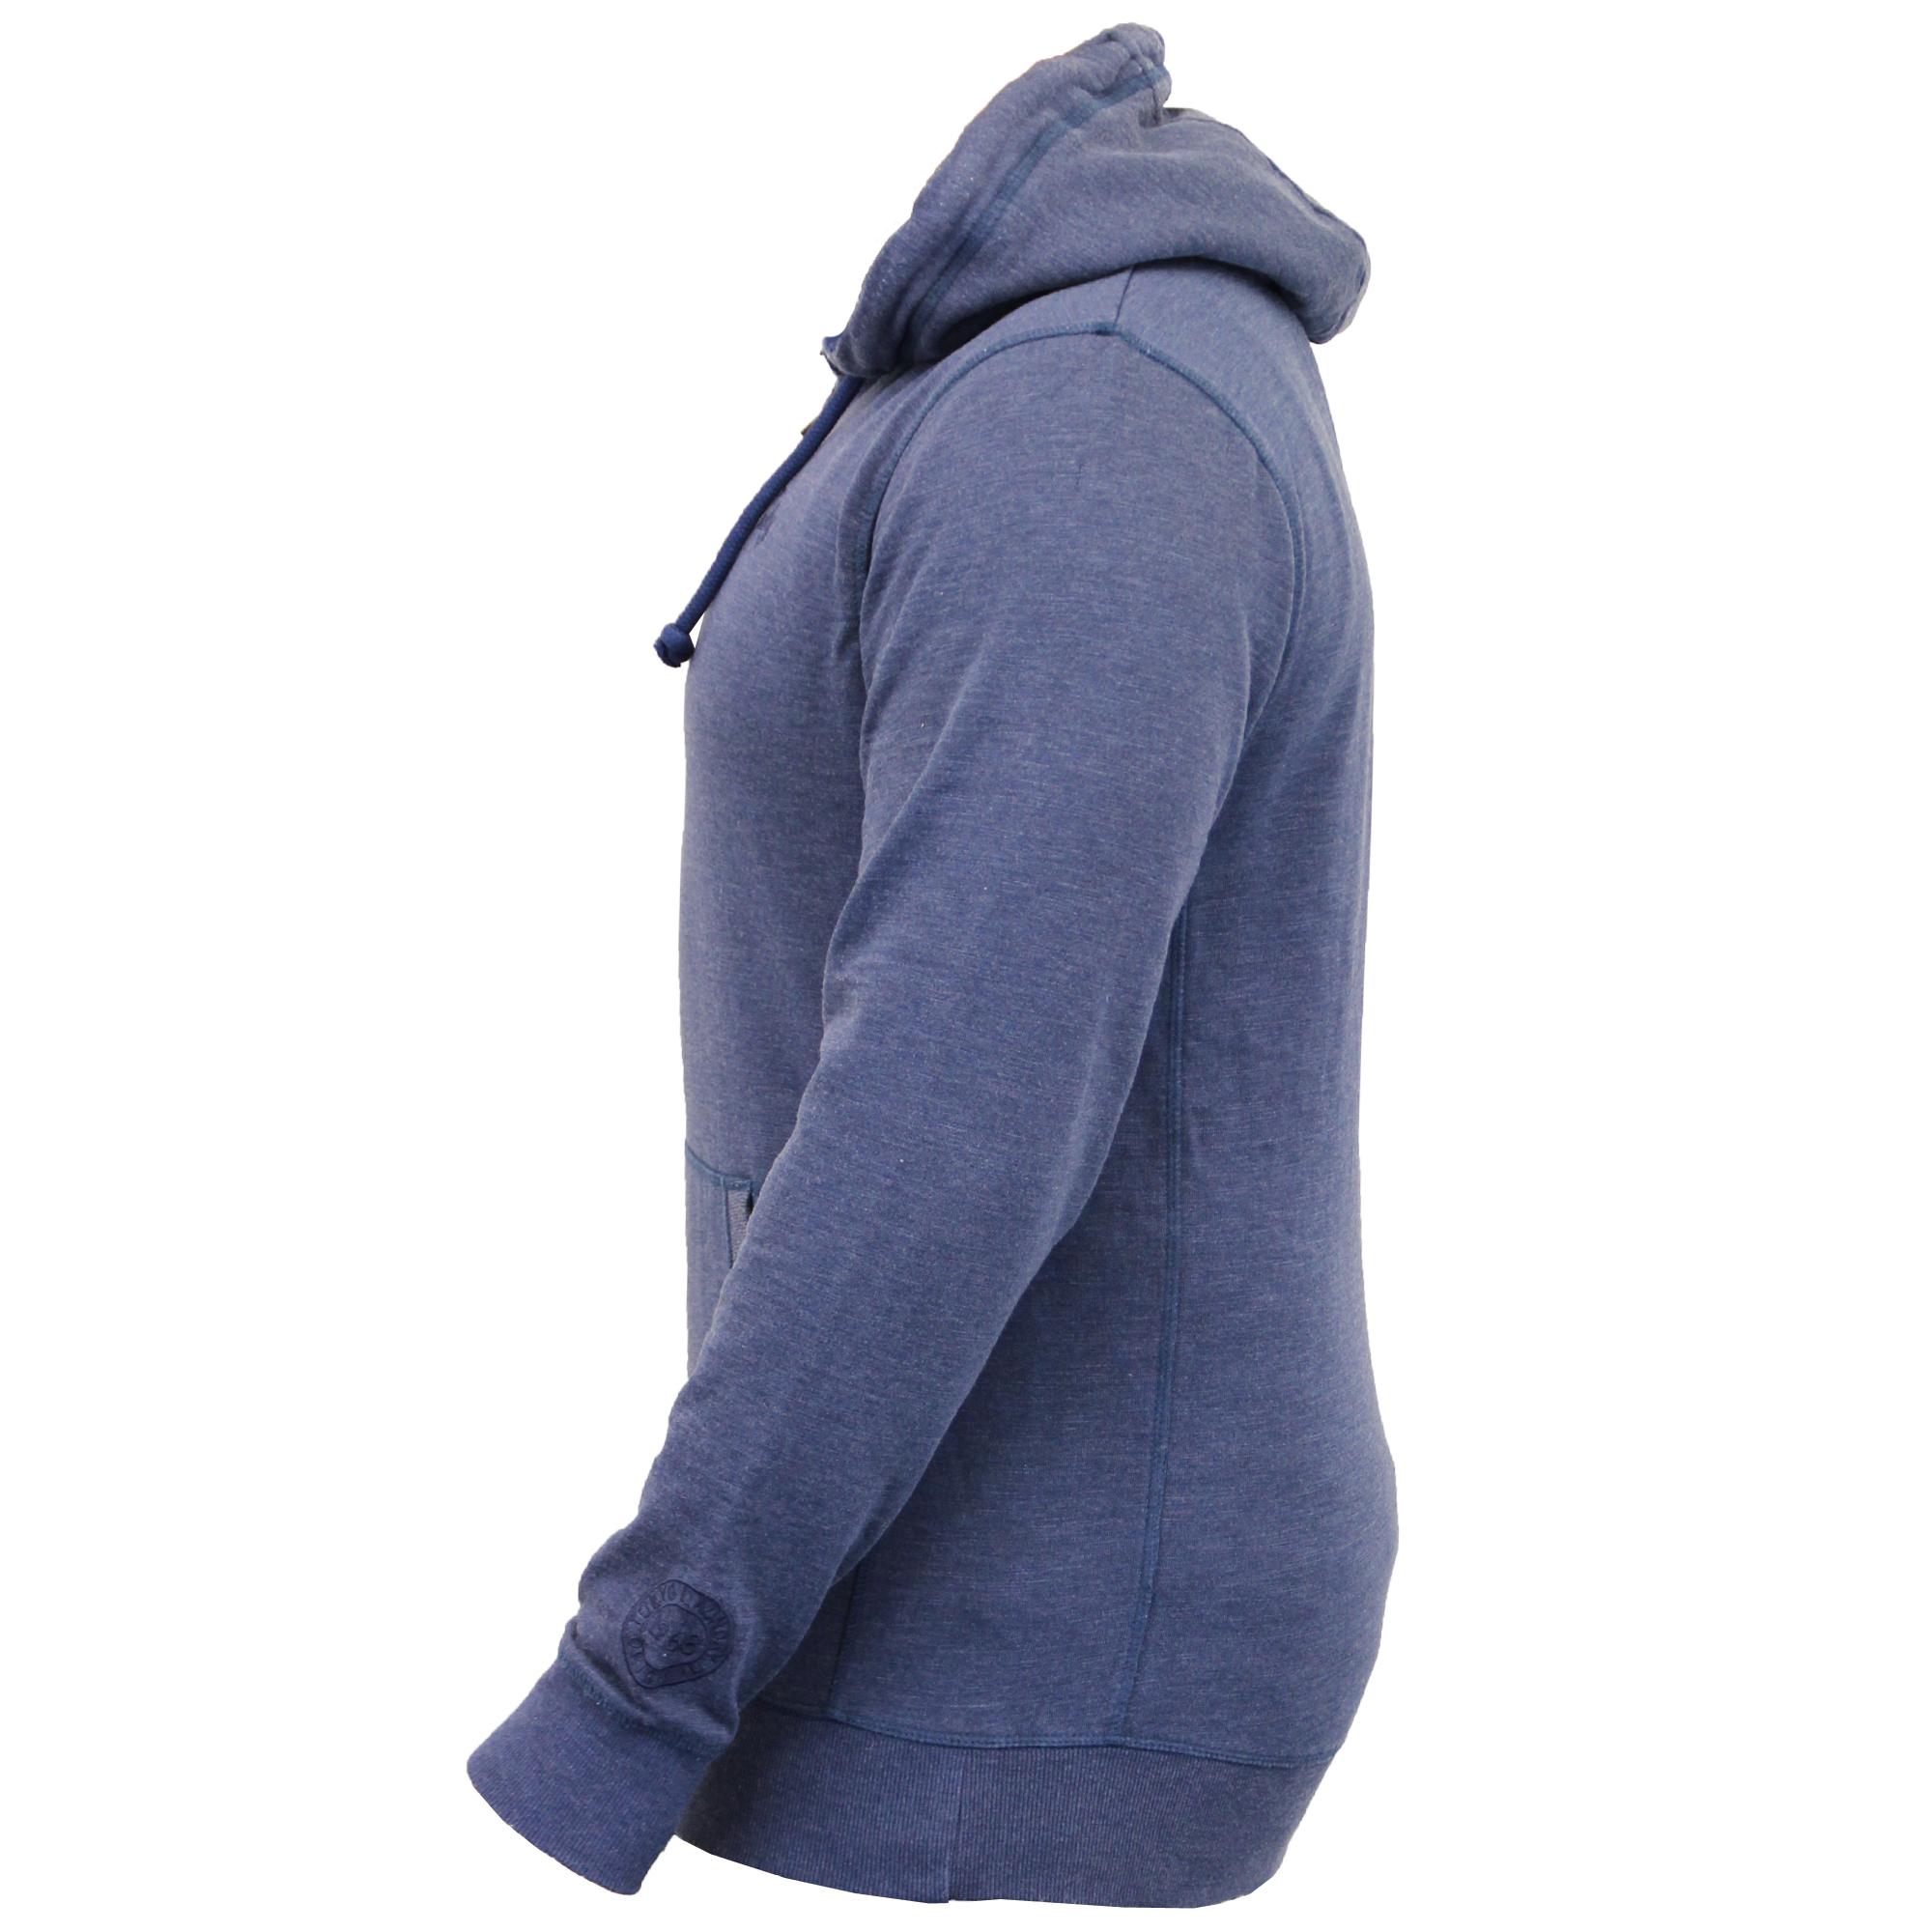 Mens-Sweatshirt-Tokyo-Laundry-Hooded-Top-Sweat-Applique-Zip-Gym-Fleece-Lined-New thumbnail 3